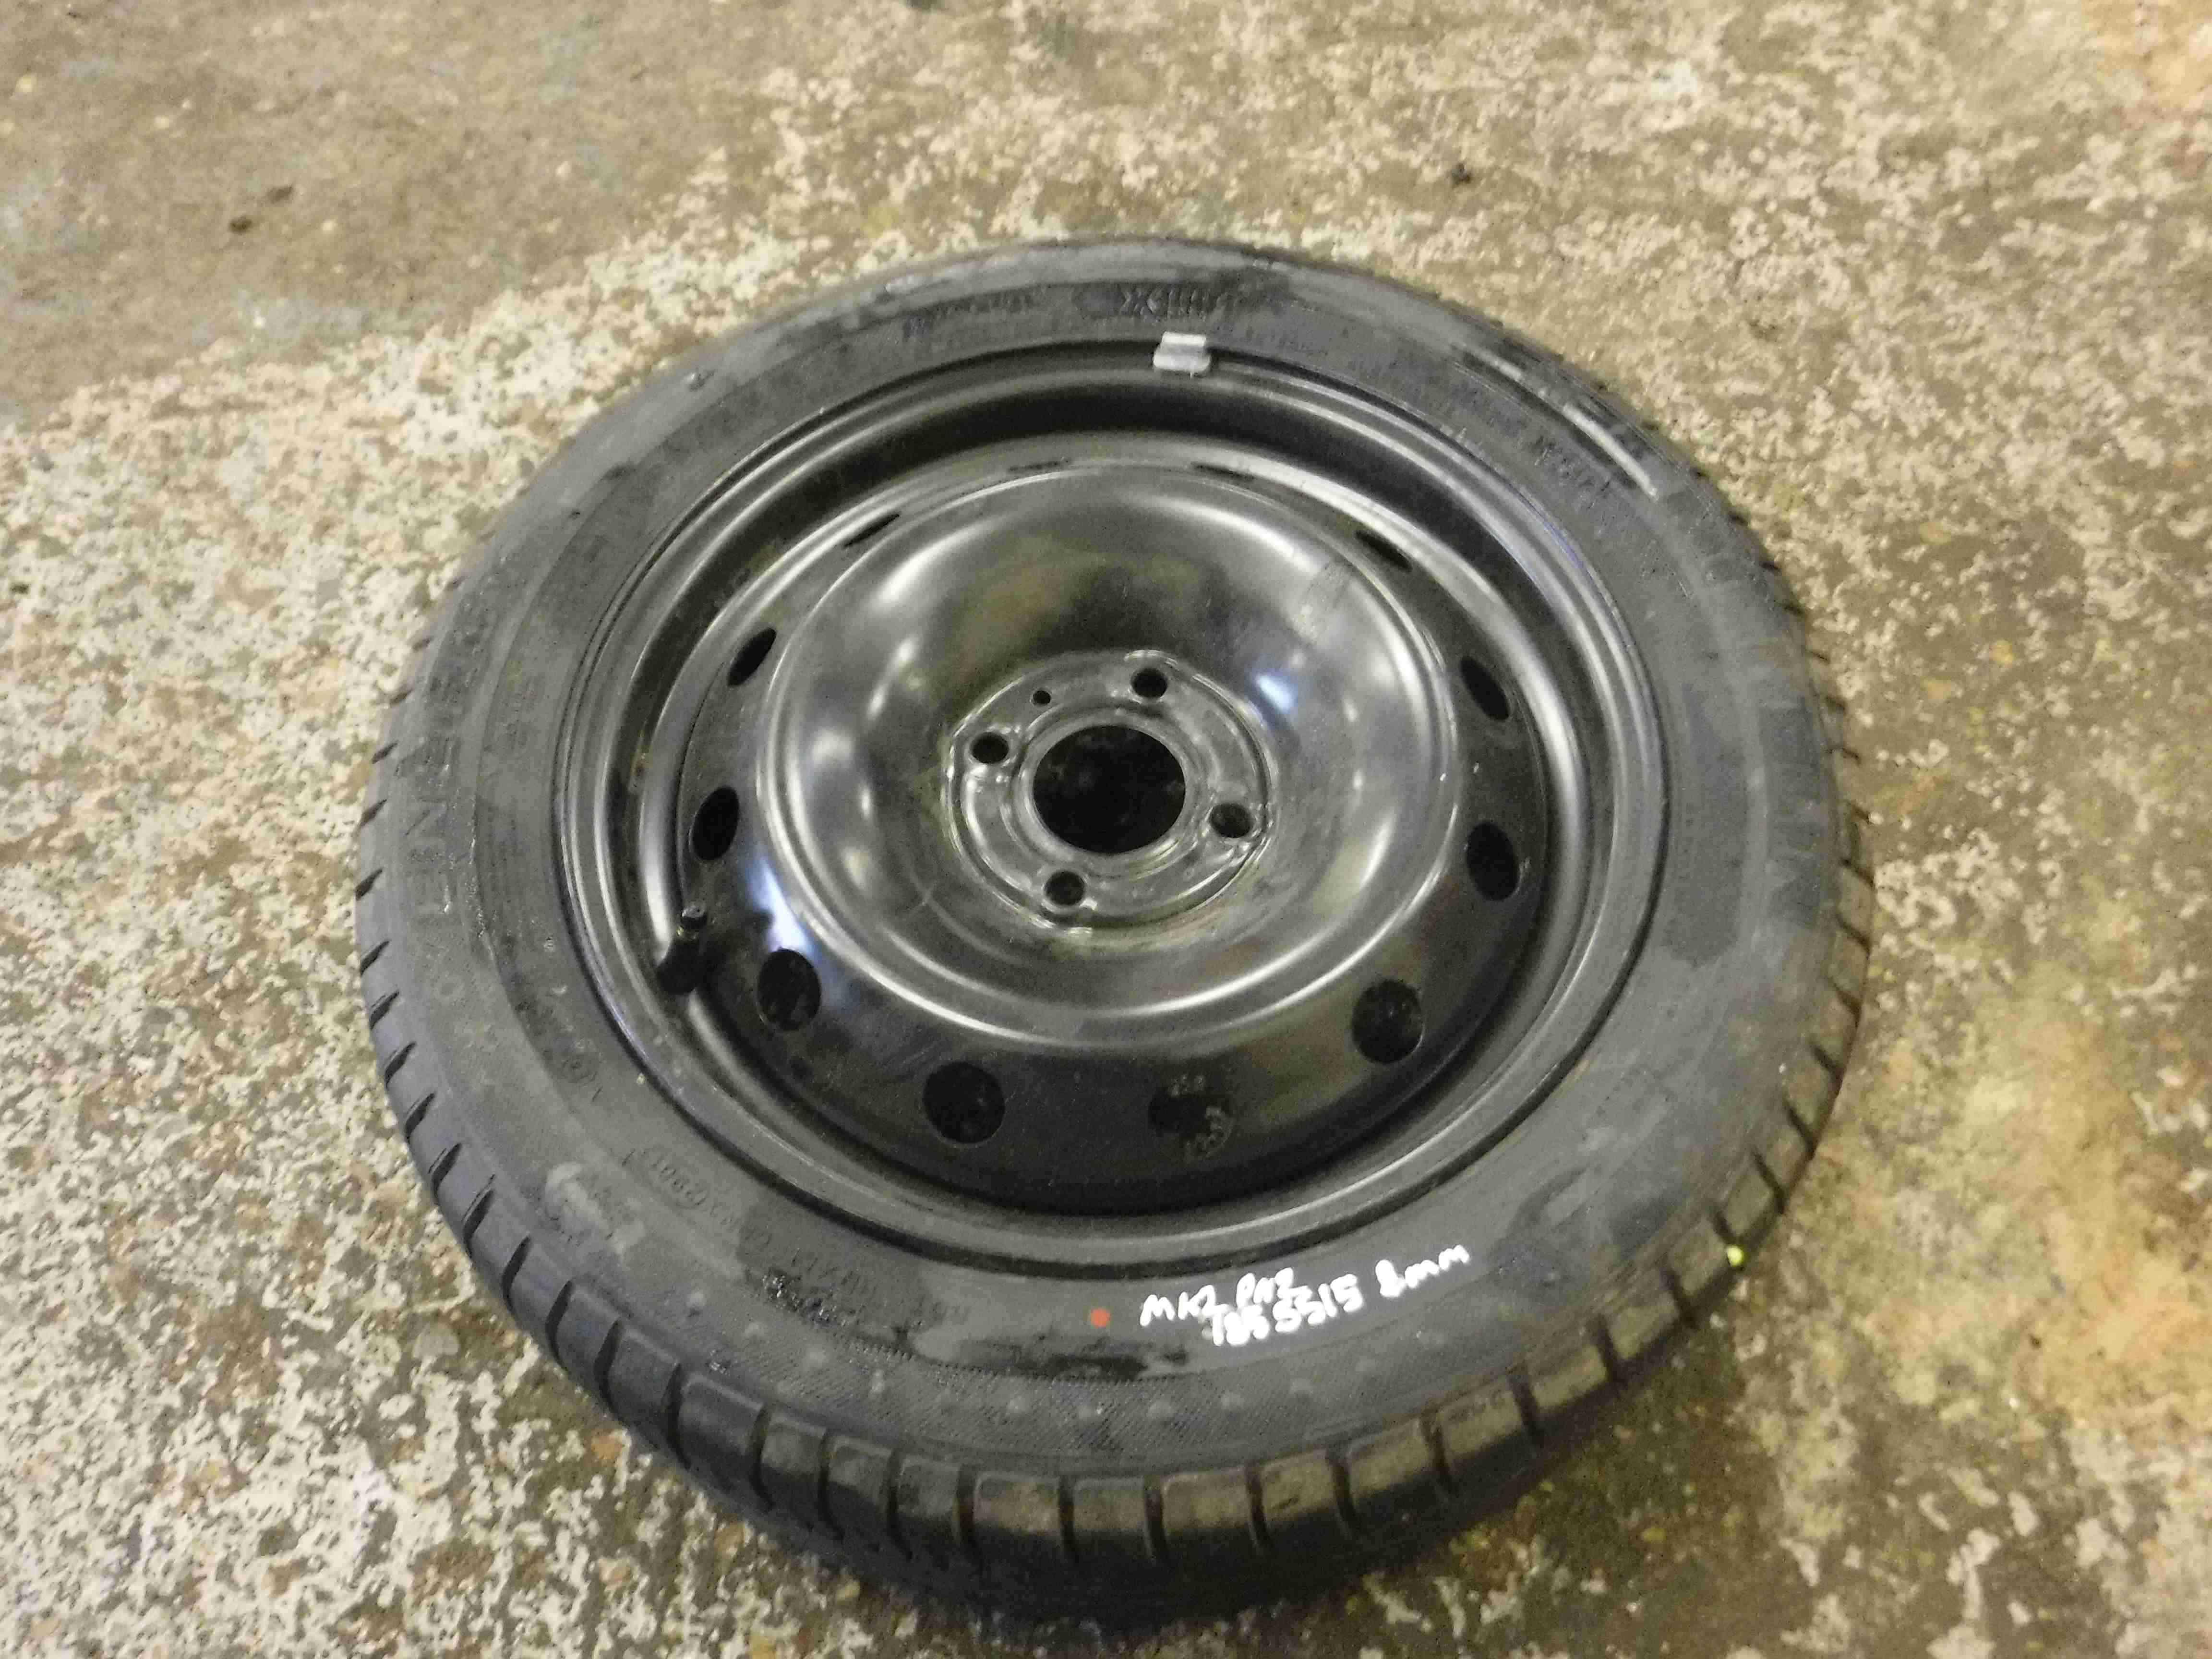 Renault Clio MK2 2001-2006 Steel Wheel Rim  Tyre 185 55 15 8mm Tread 45